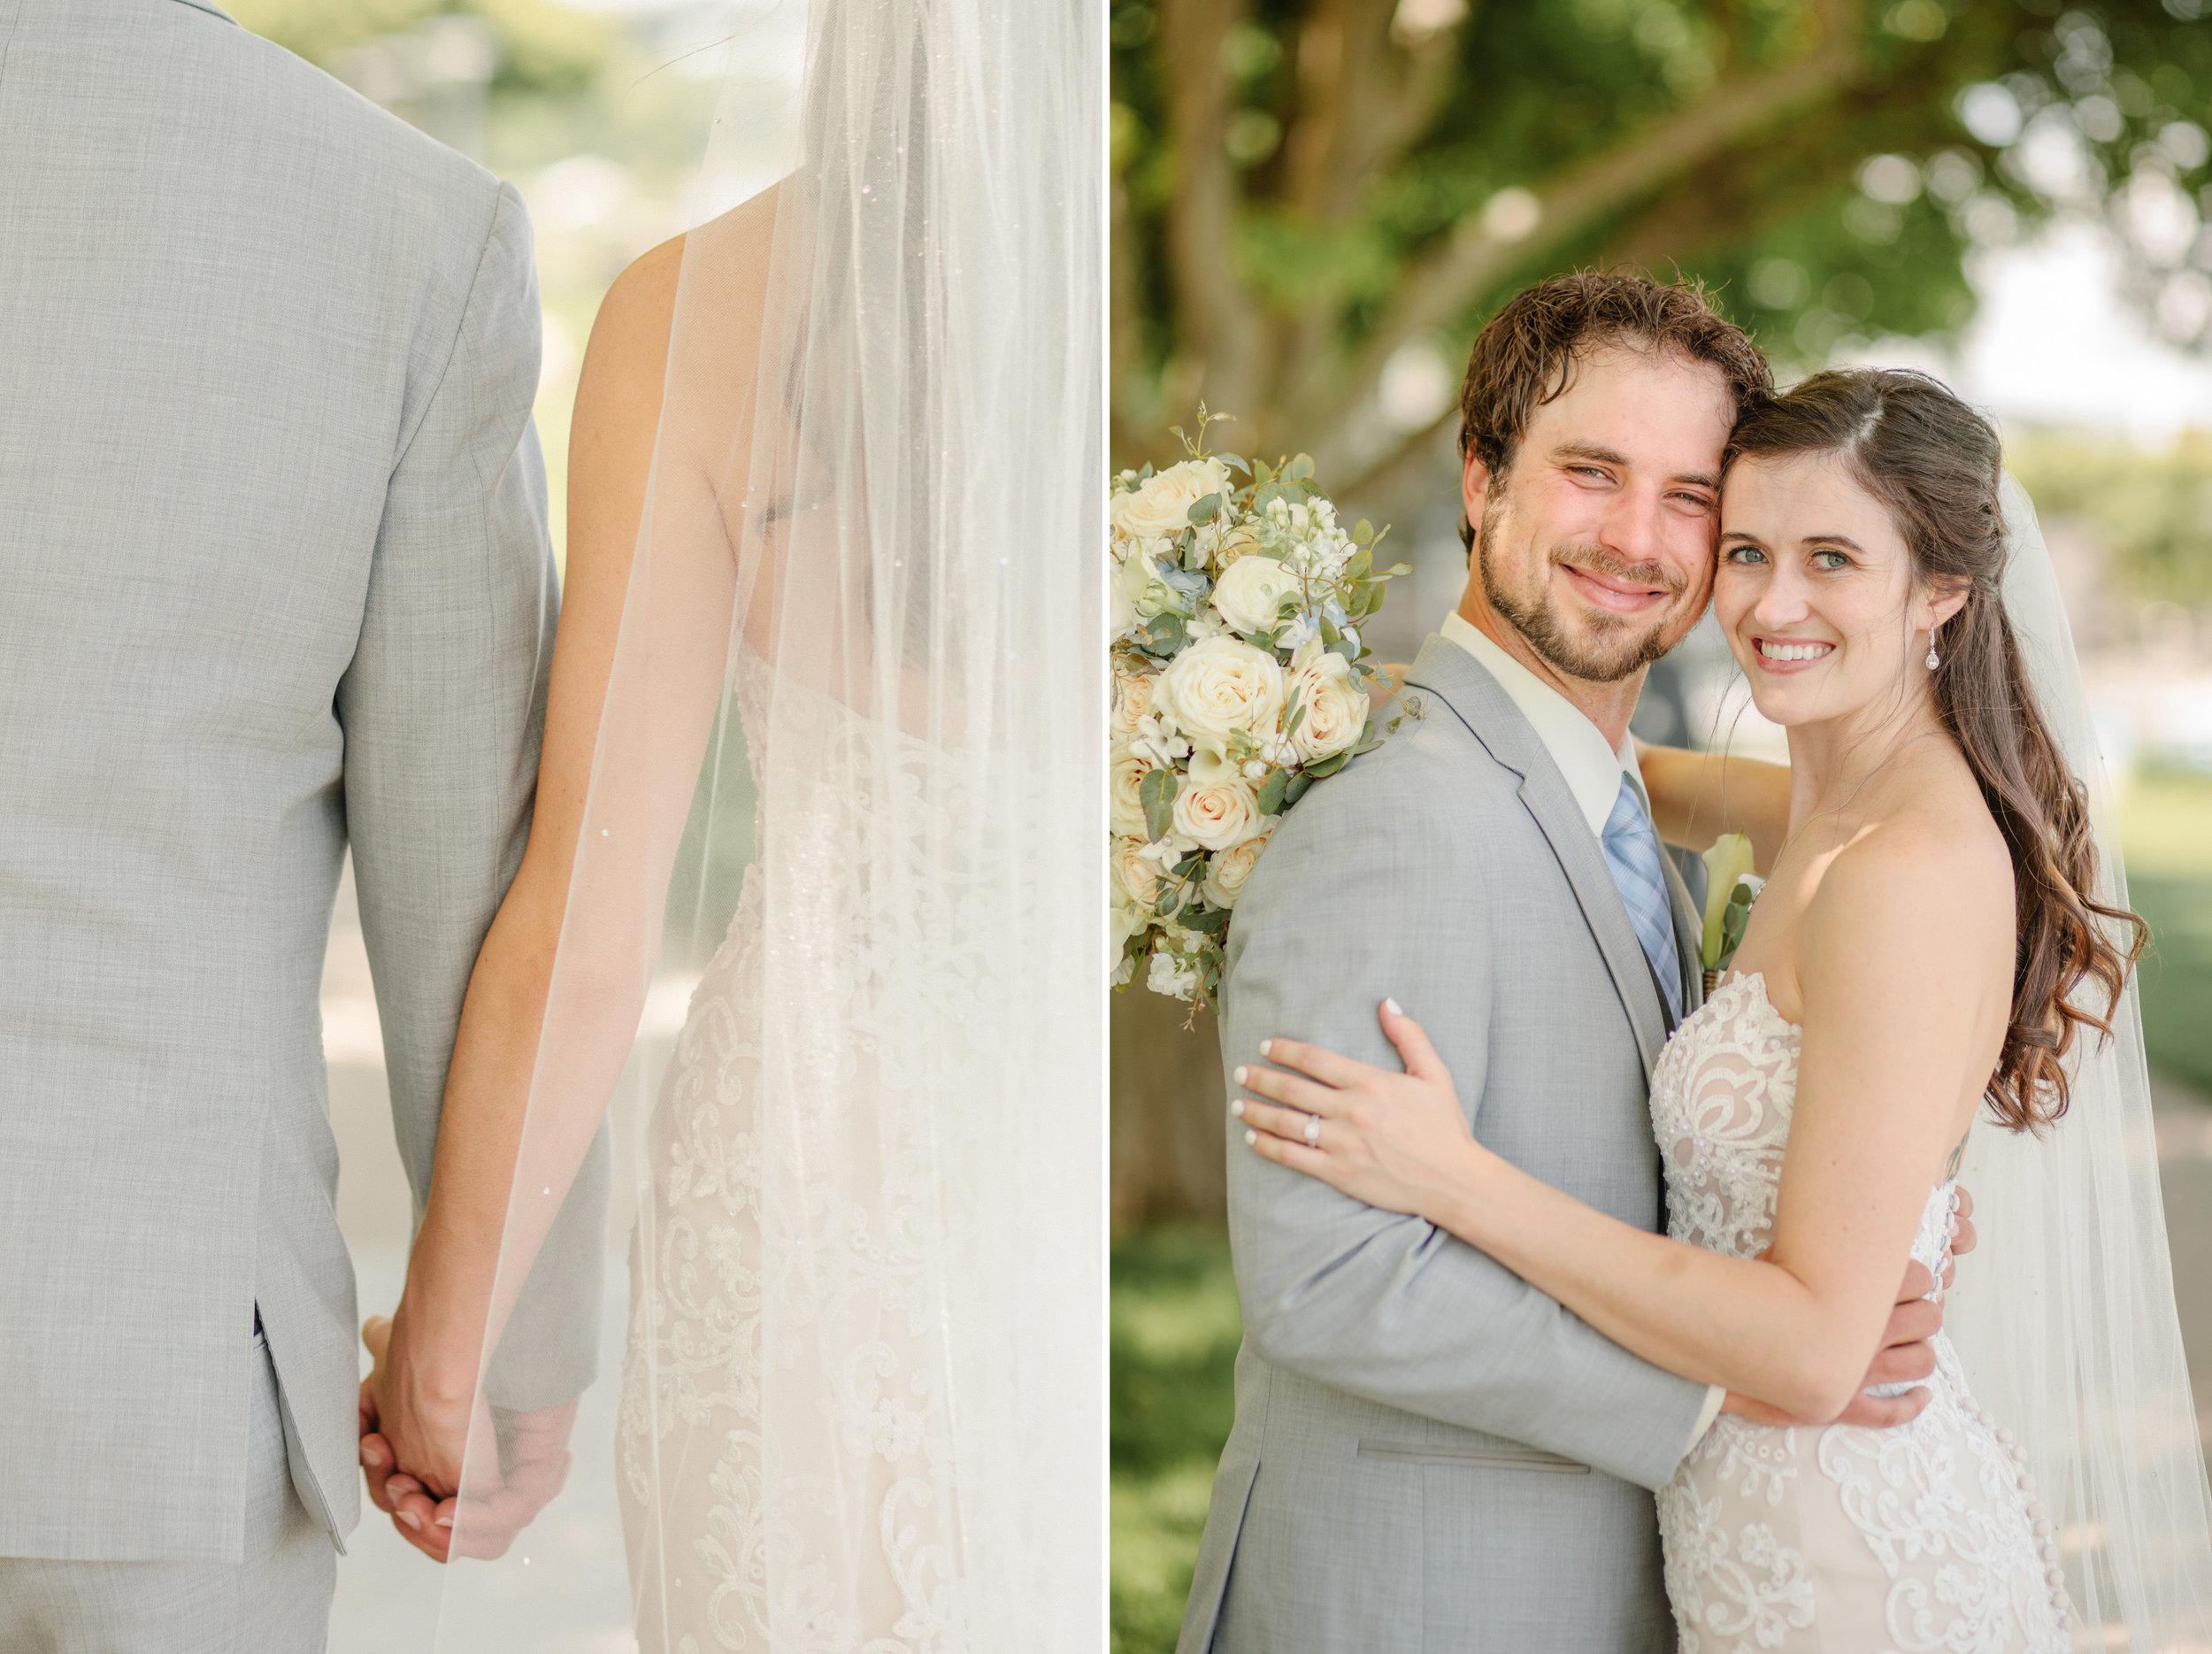 amelia renee photography Des Moines Iowa wedding photographers